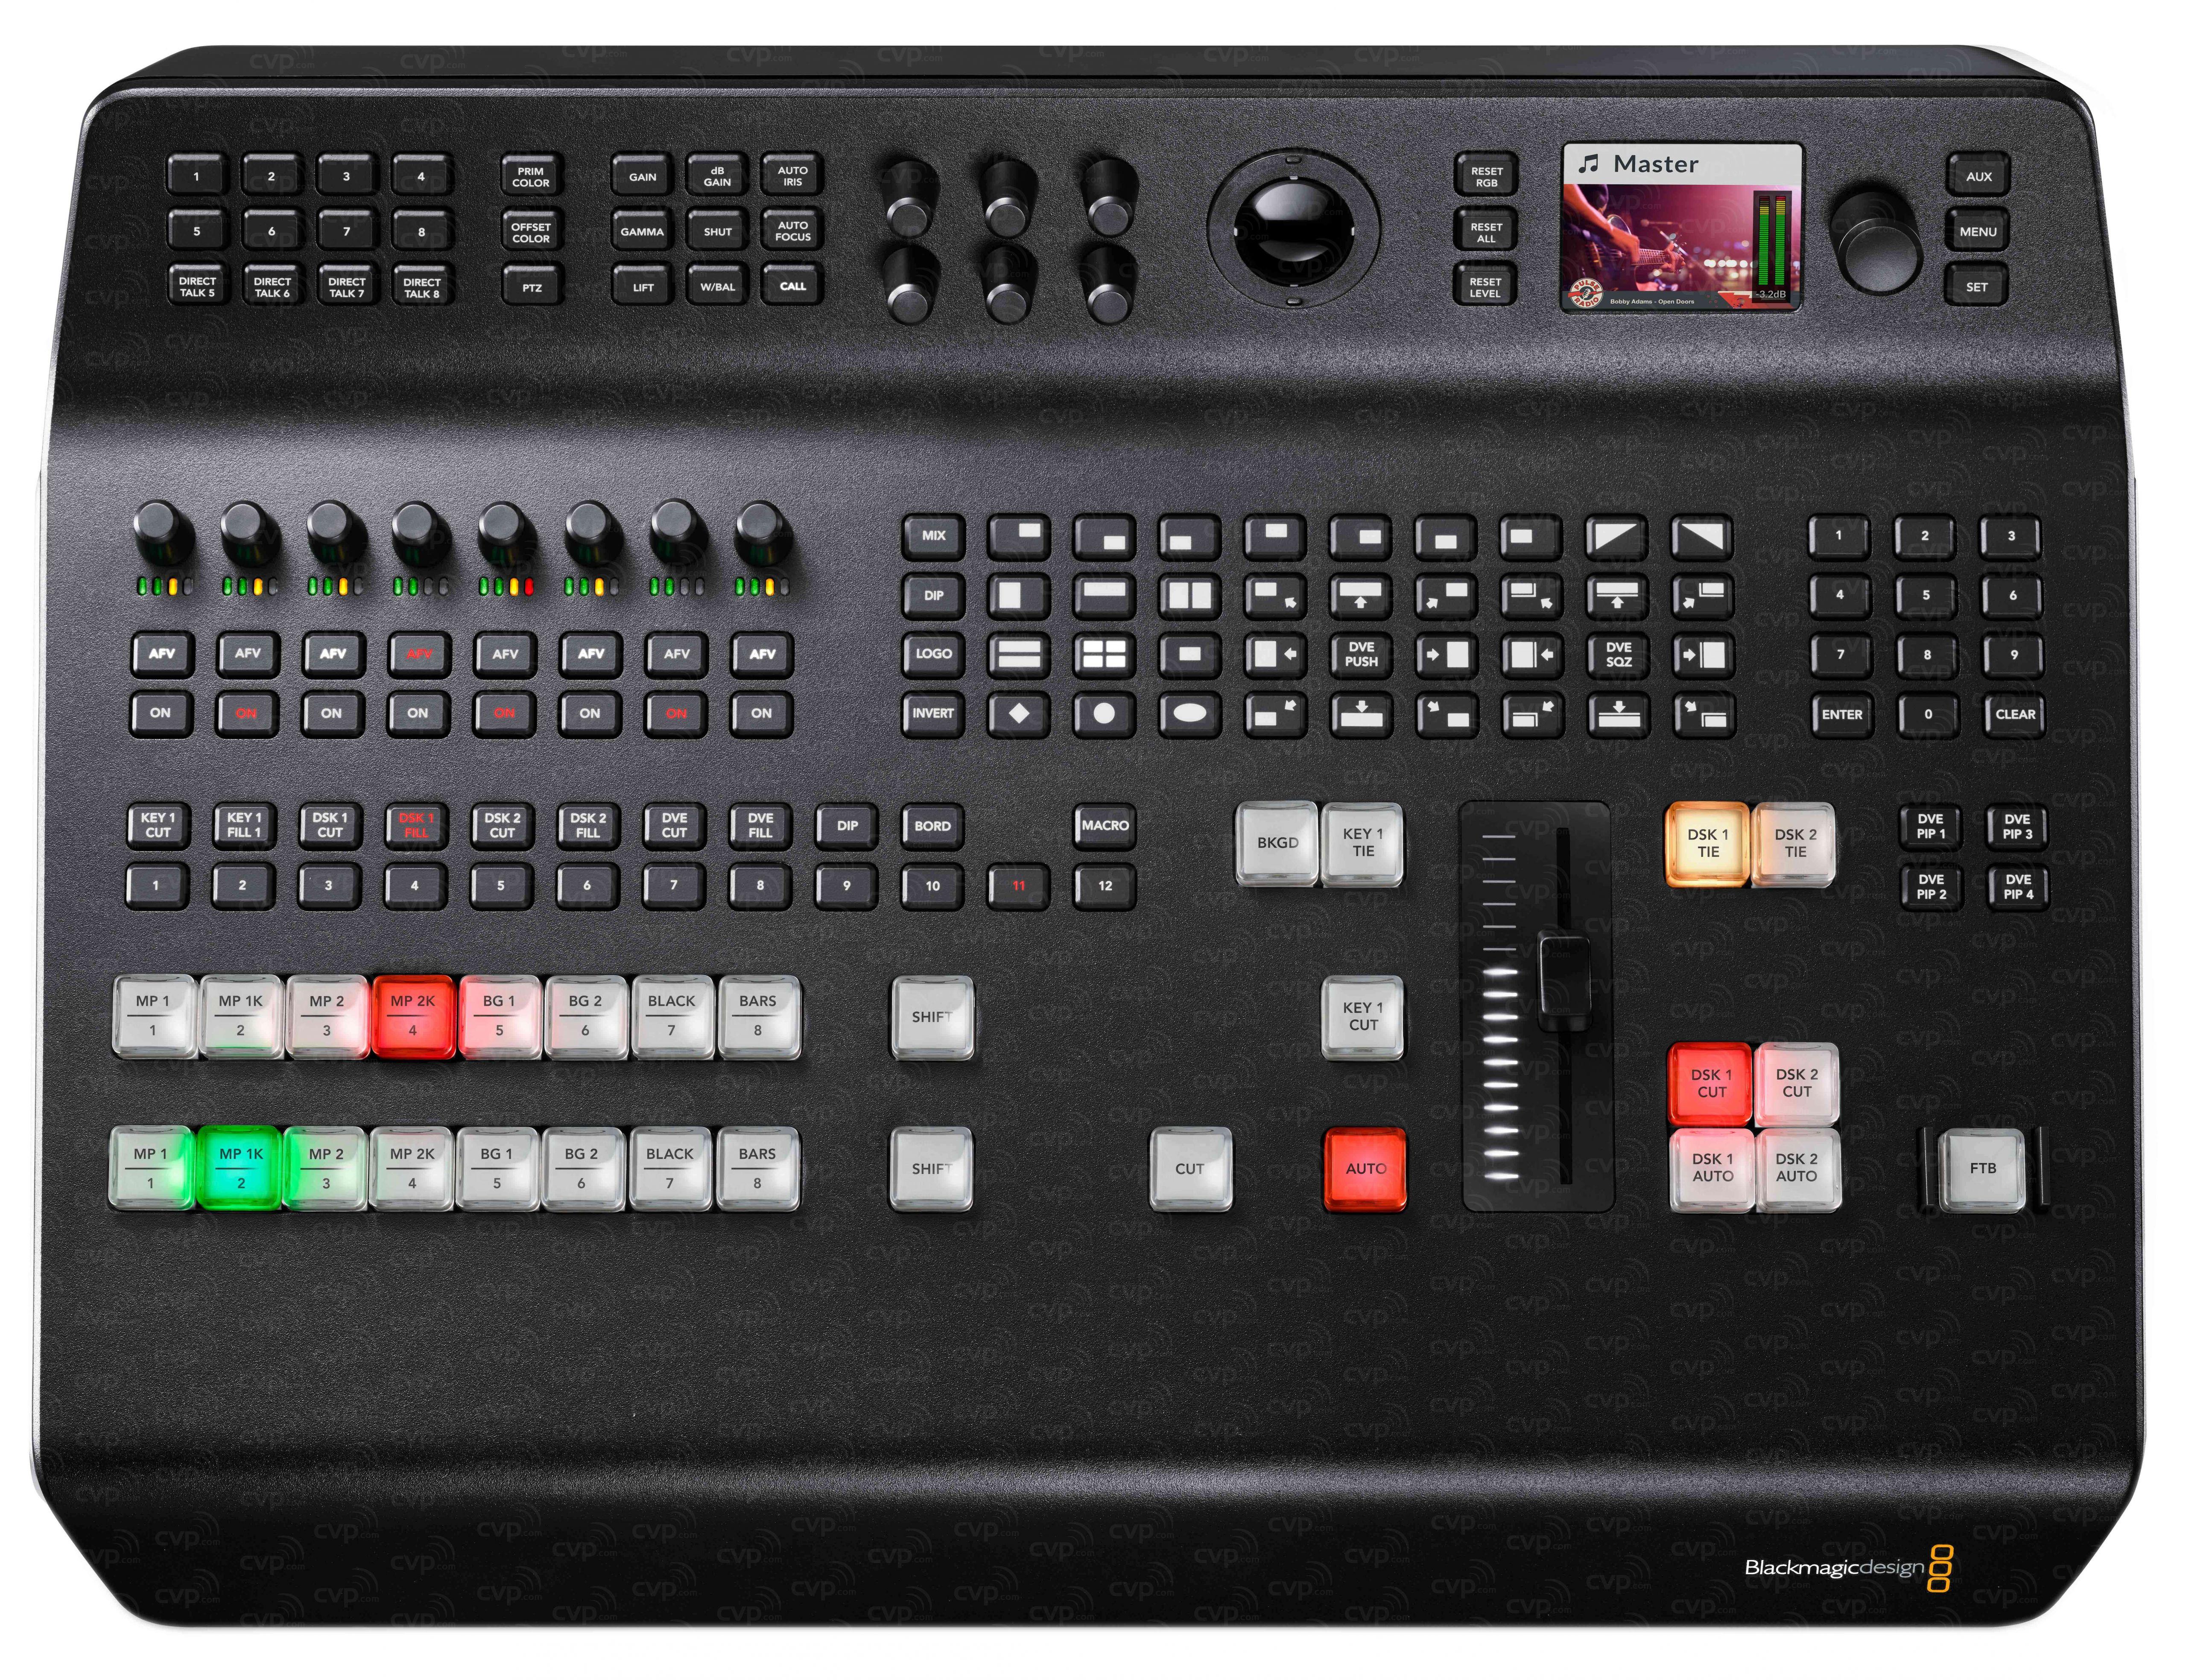 Buy Blackmagic Design Bmd Swatemtvstu Prohd Bmdswatemtvstuprohd Atem Television Studio Pro Hd Live Production Switcher